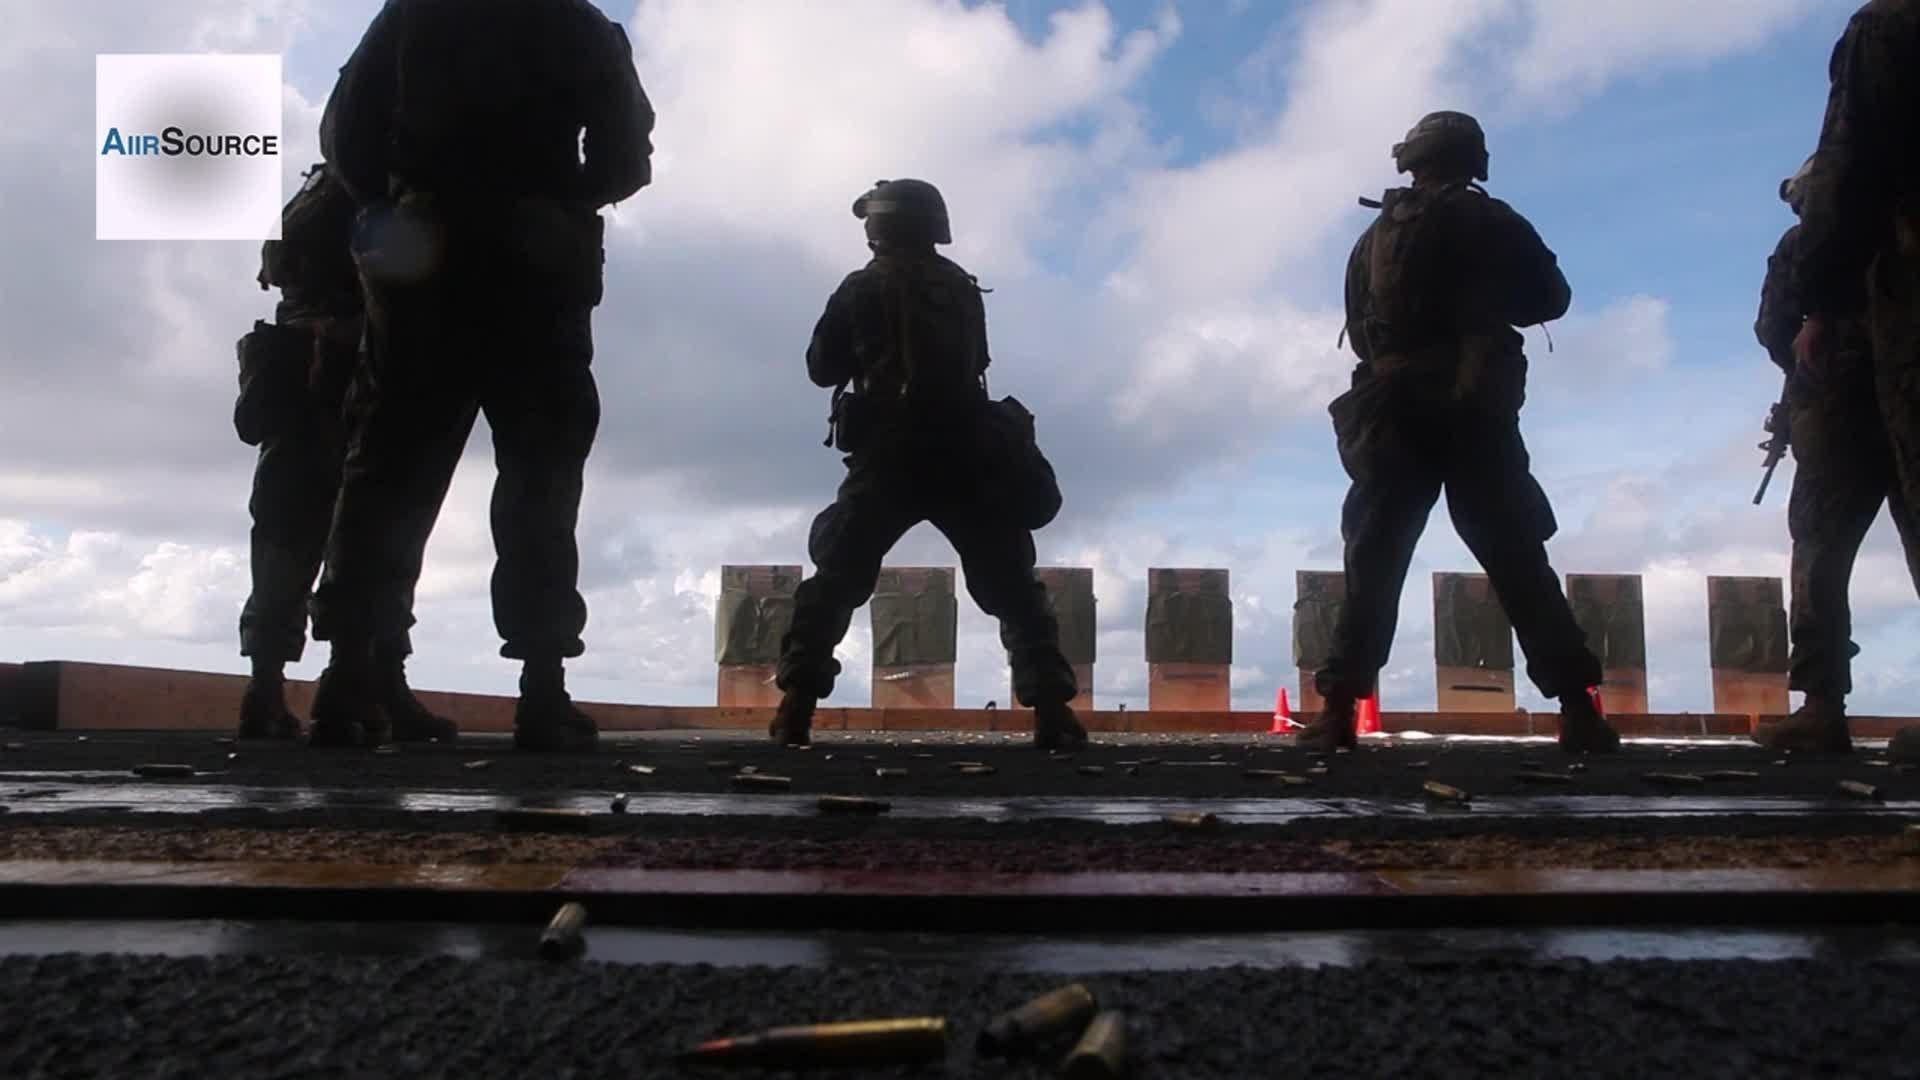 us marines blt engage targets while at sea youtube us